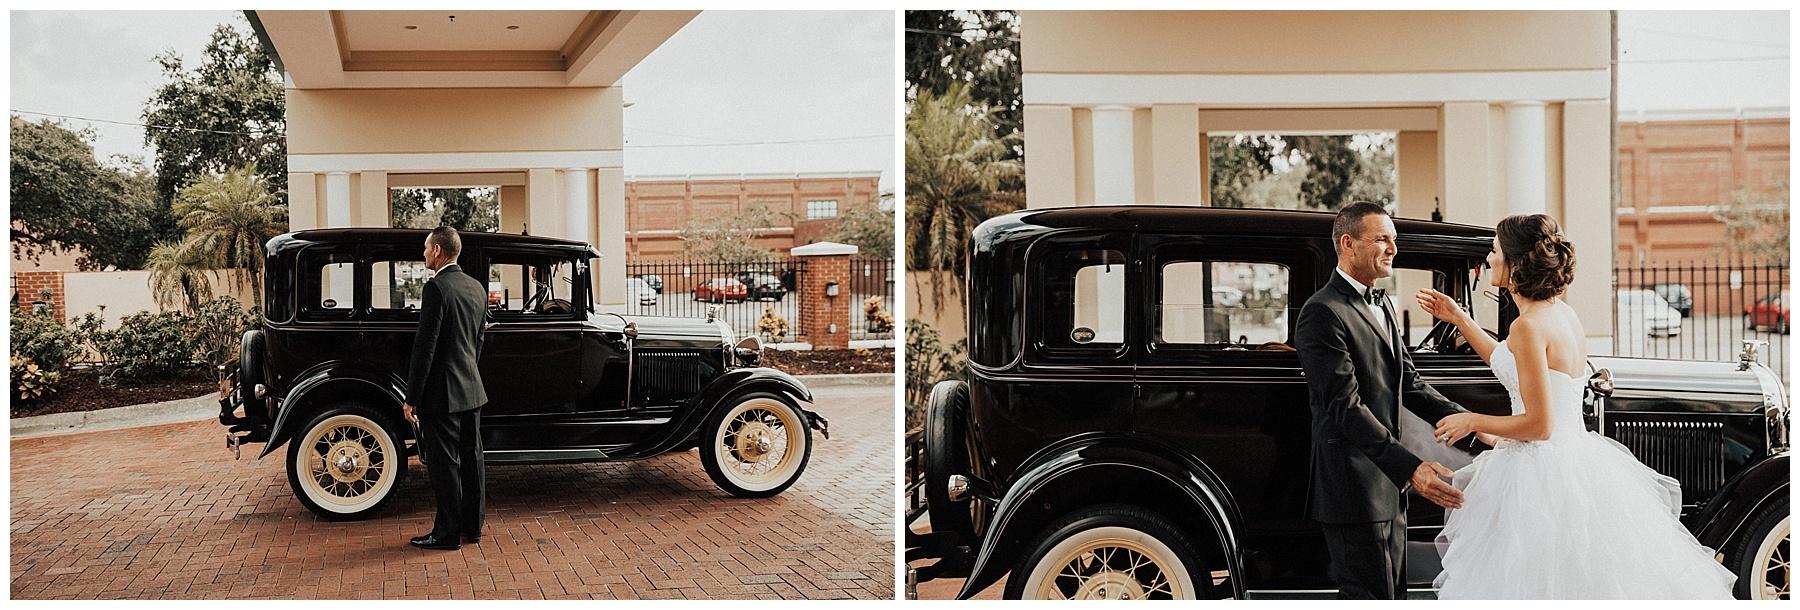 YBOR Wedding Tampa Wedding Photographer-52.jpg